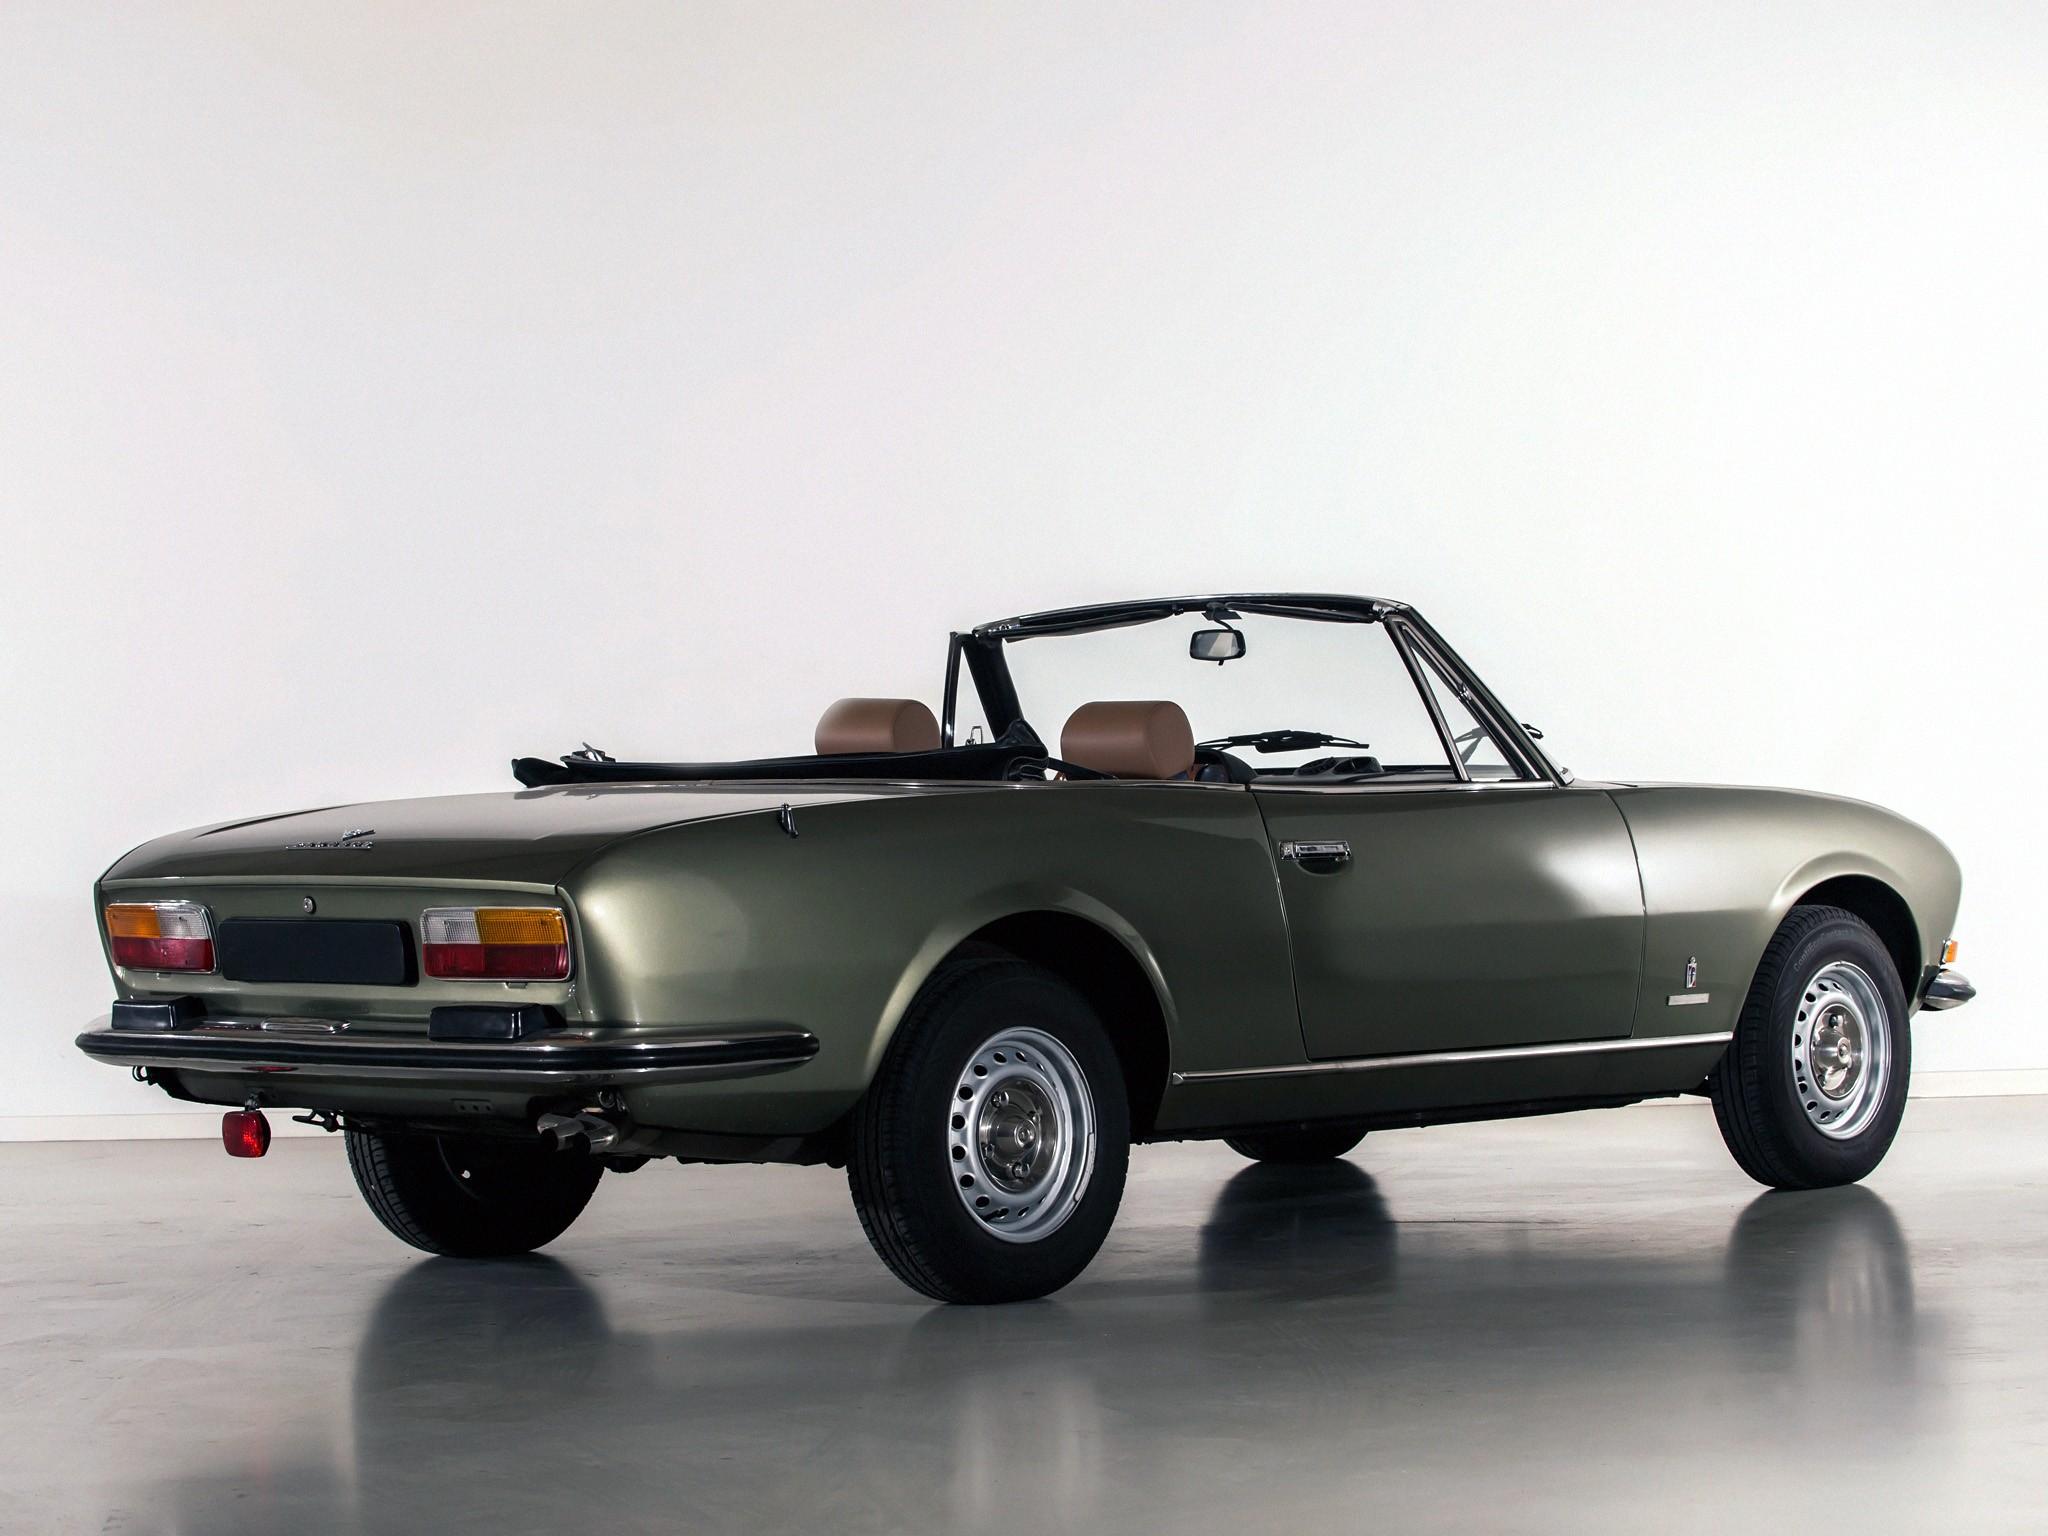 peugeot 504 cabriolet specs 1974 1975 1976 1977 1978 1979 1980 1981 1982 autoevolution. Black Bedroom Furniture Sets. Home Design Ideas